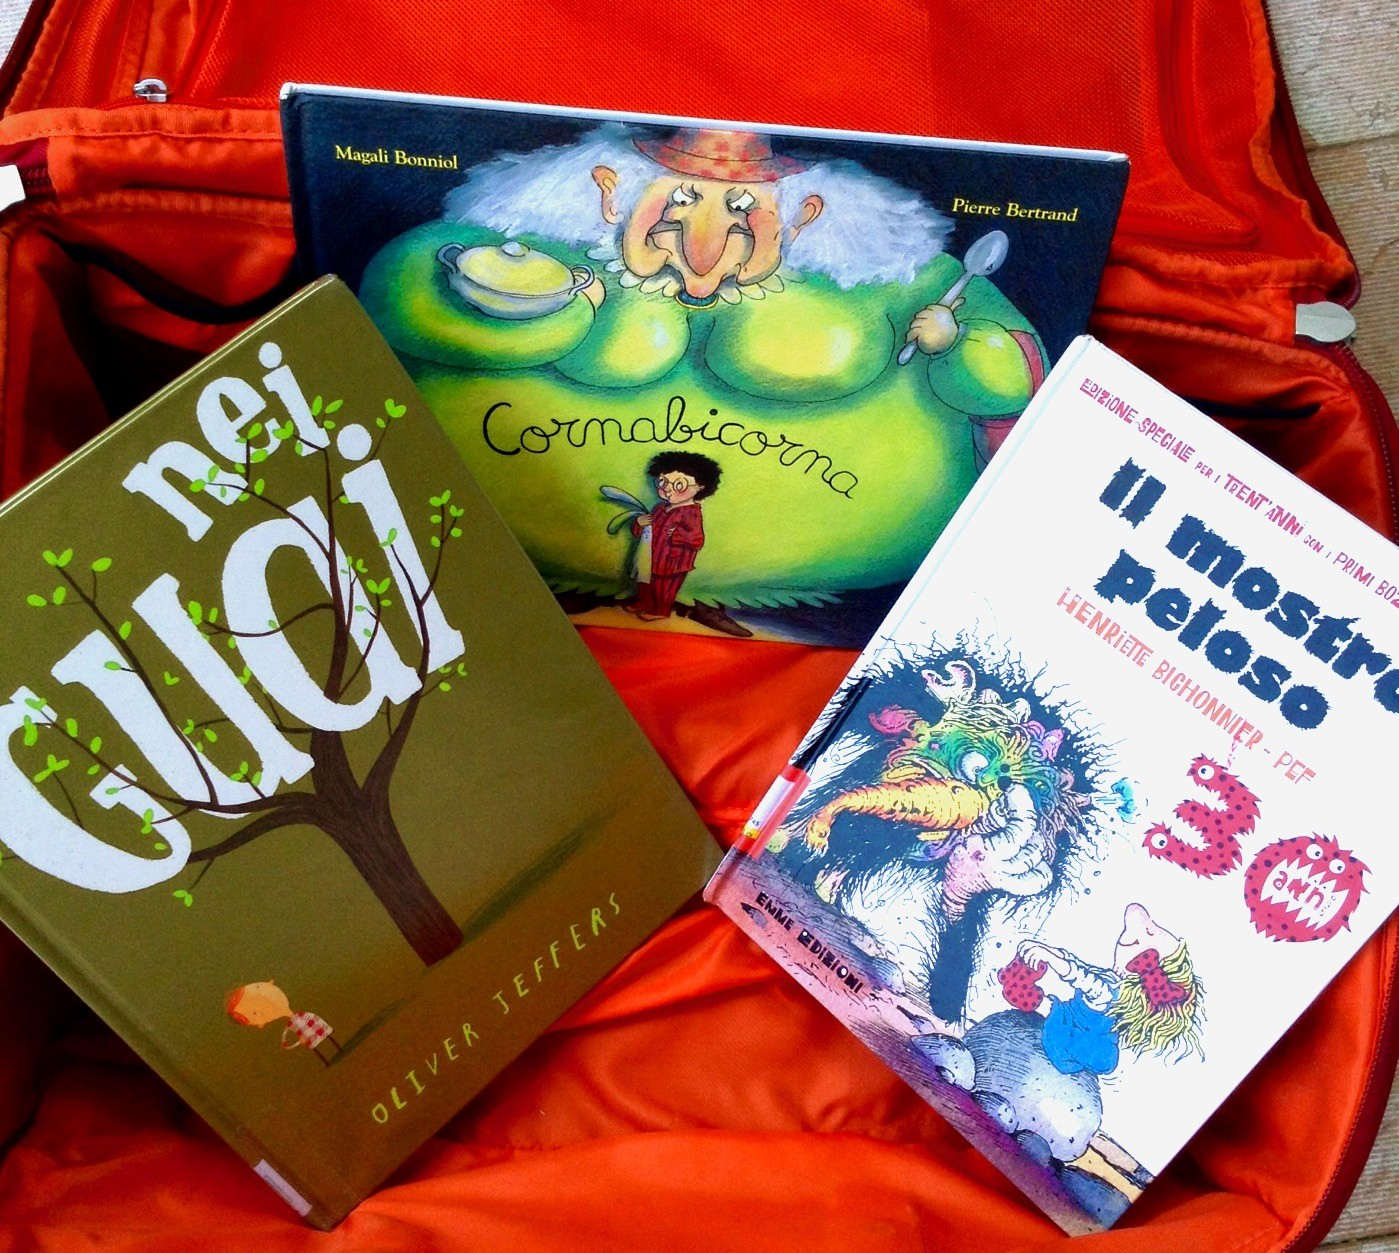 Libri per divertire